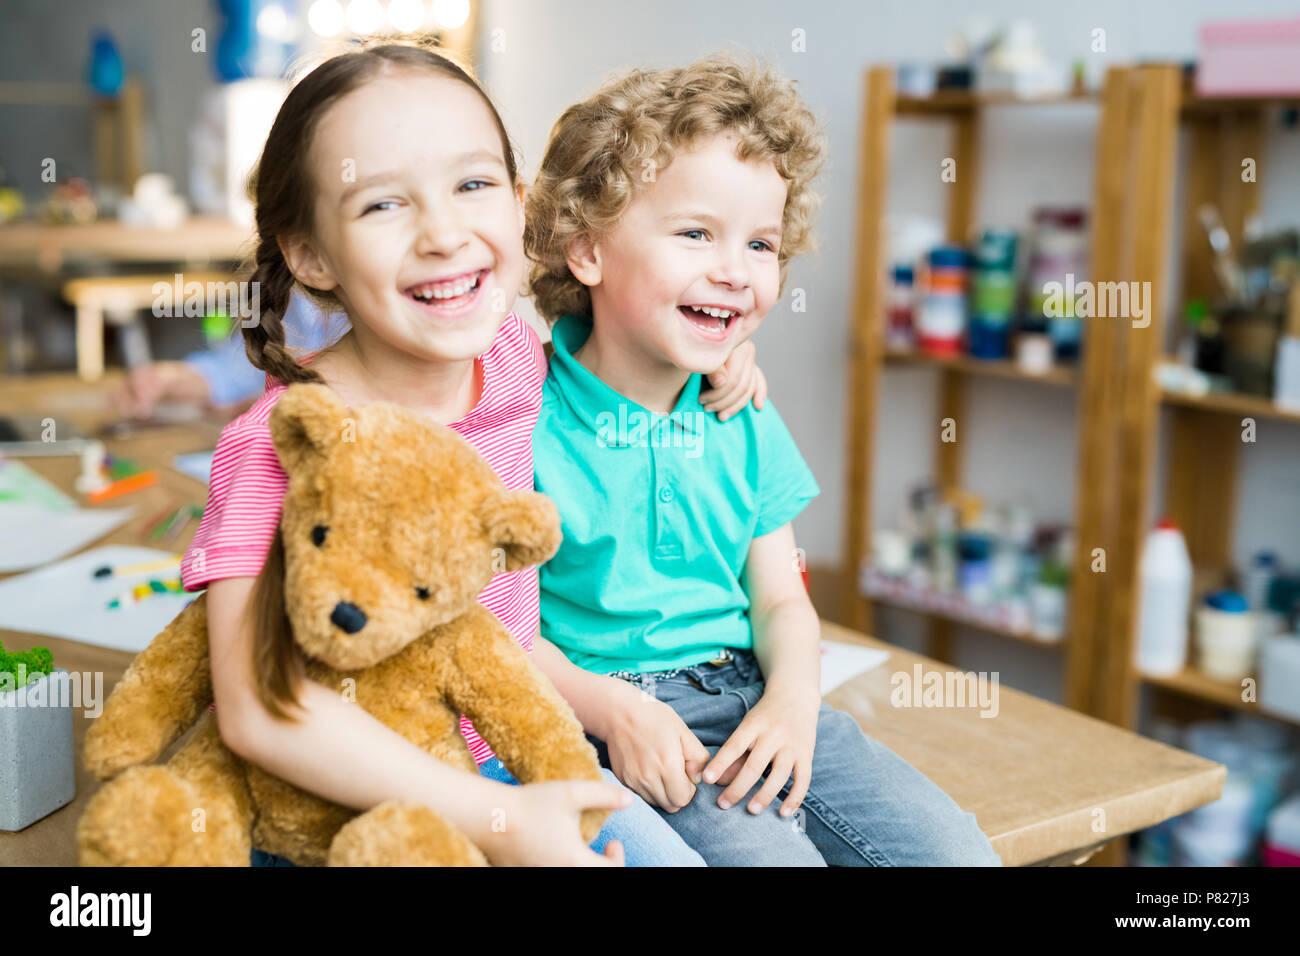 Happy Kids with Teddy Bear - Stock Image